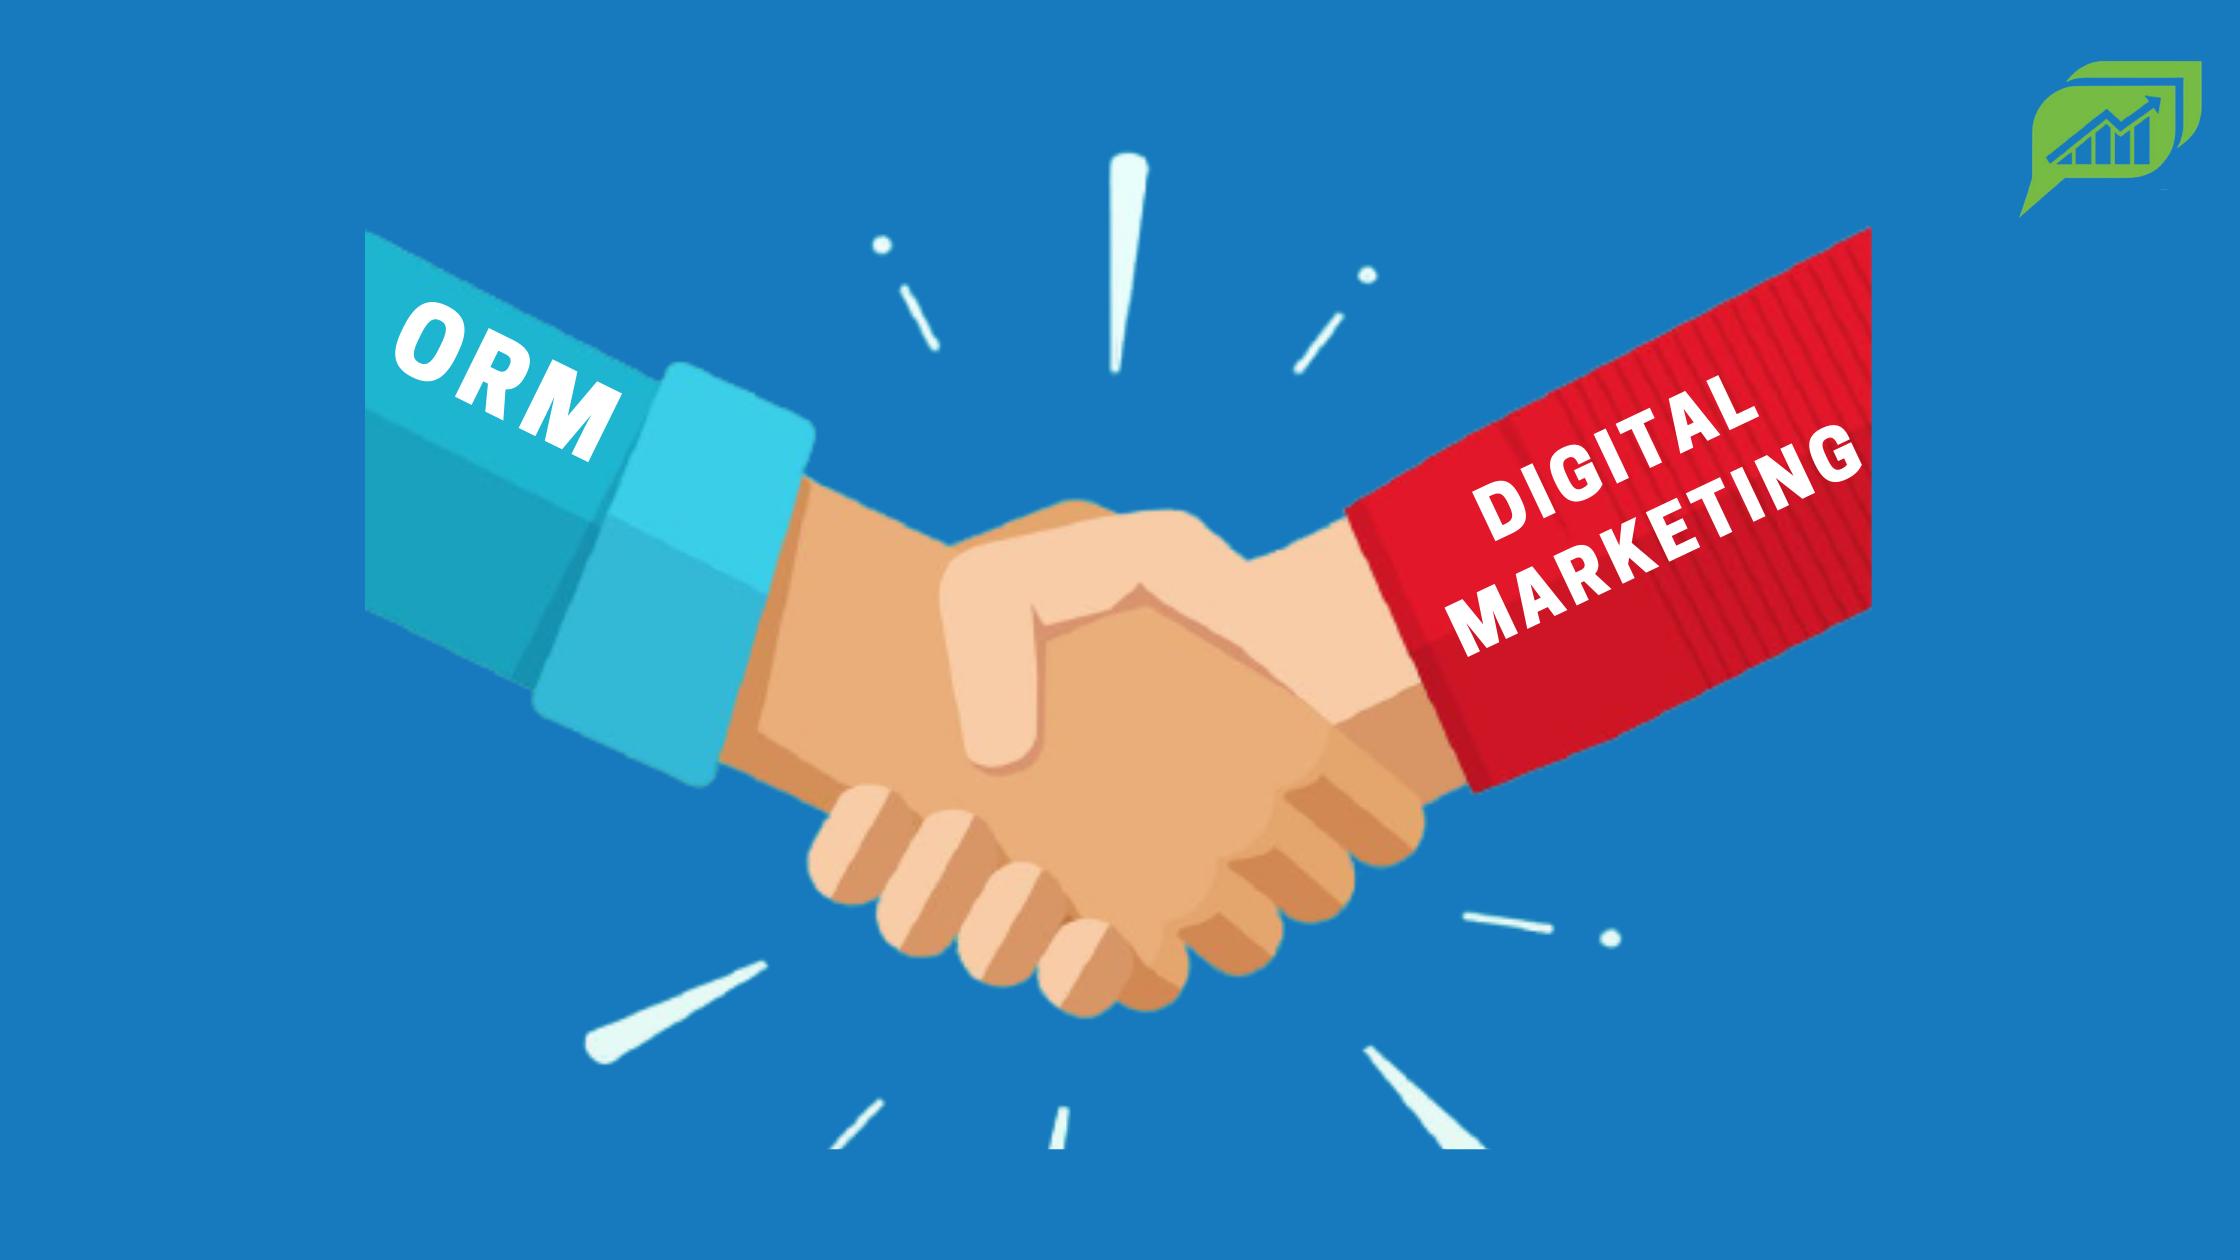 Banner showing crossed hands between ORM & Digital Marketing